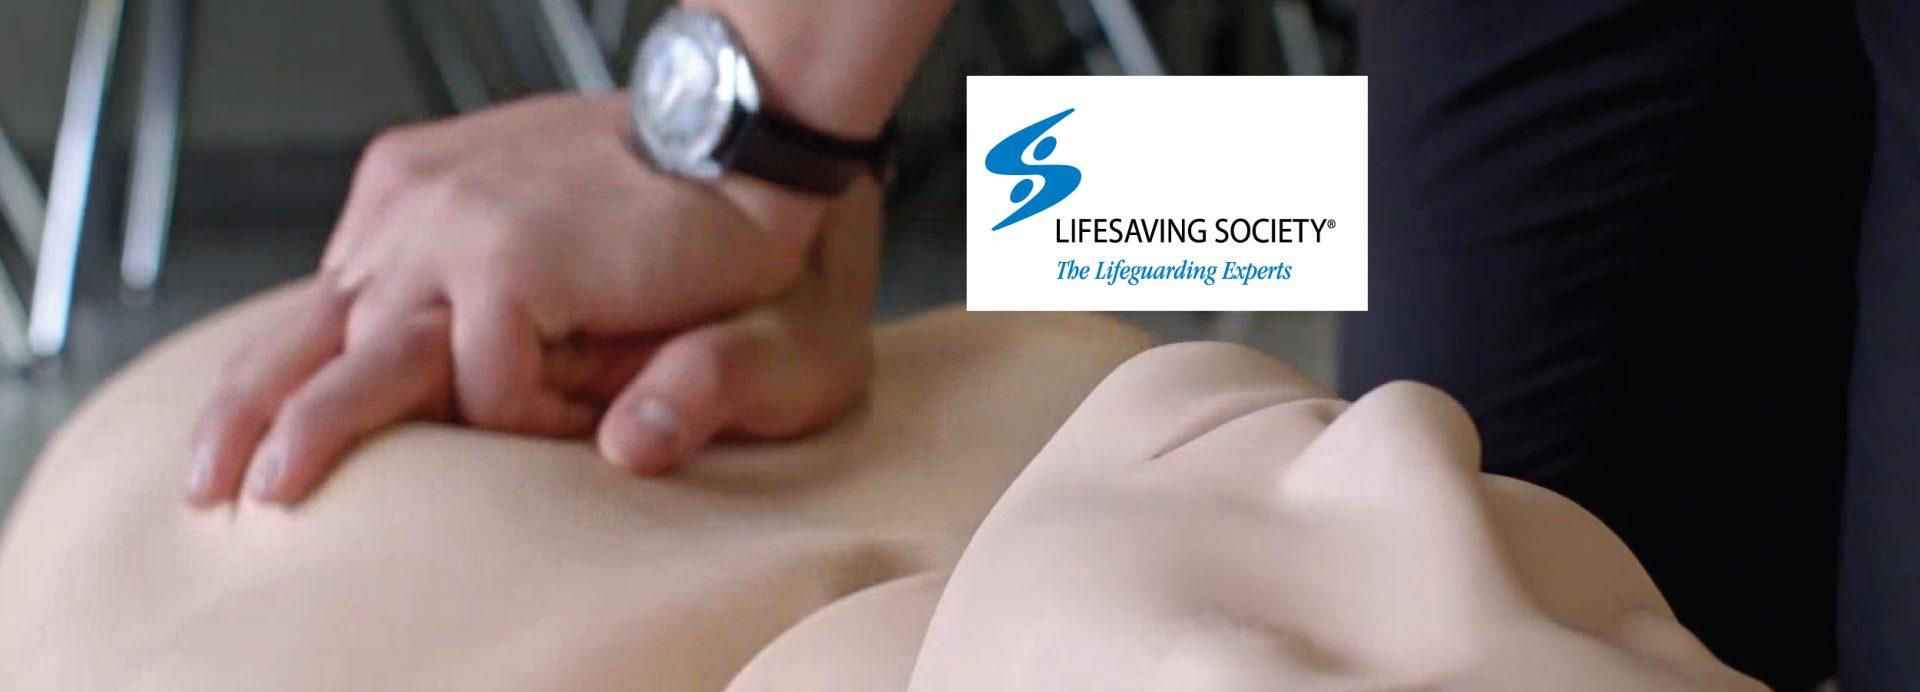 Lifesaving Society (LS) Courses